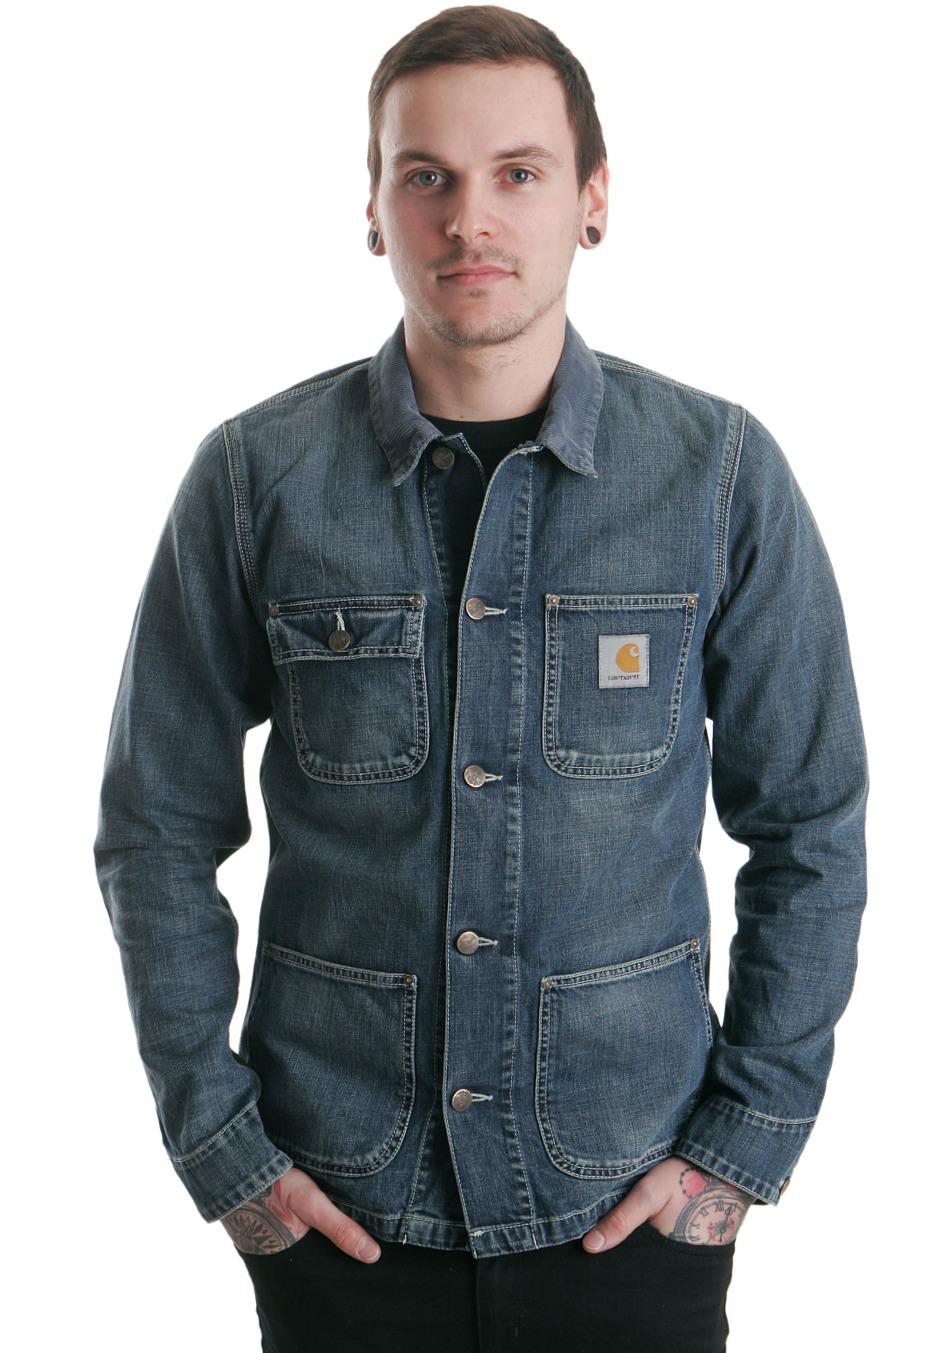 Jeansjacka man